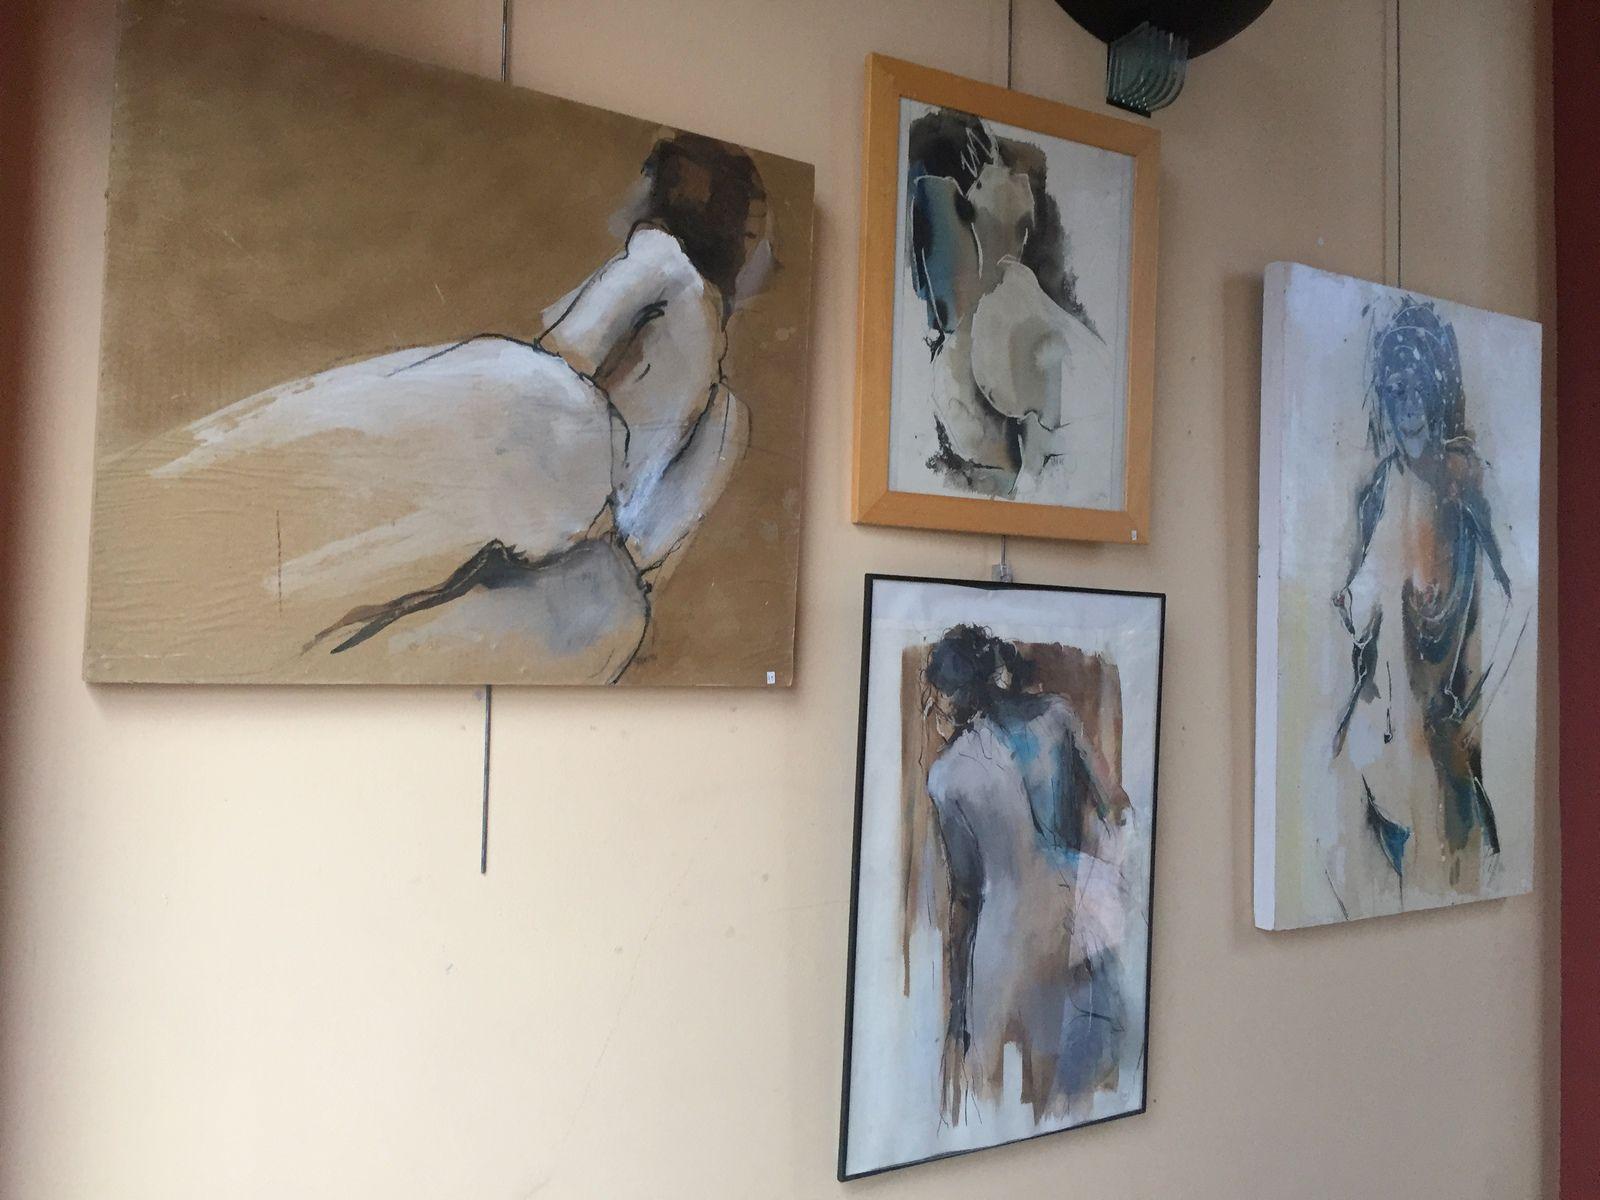 exposition peinture art pibrac daniel sentenac